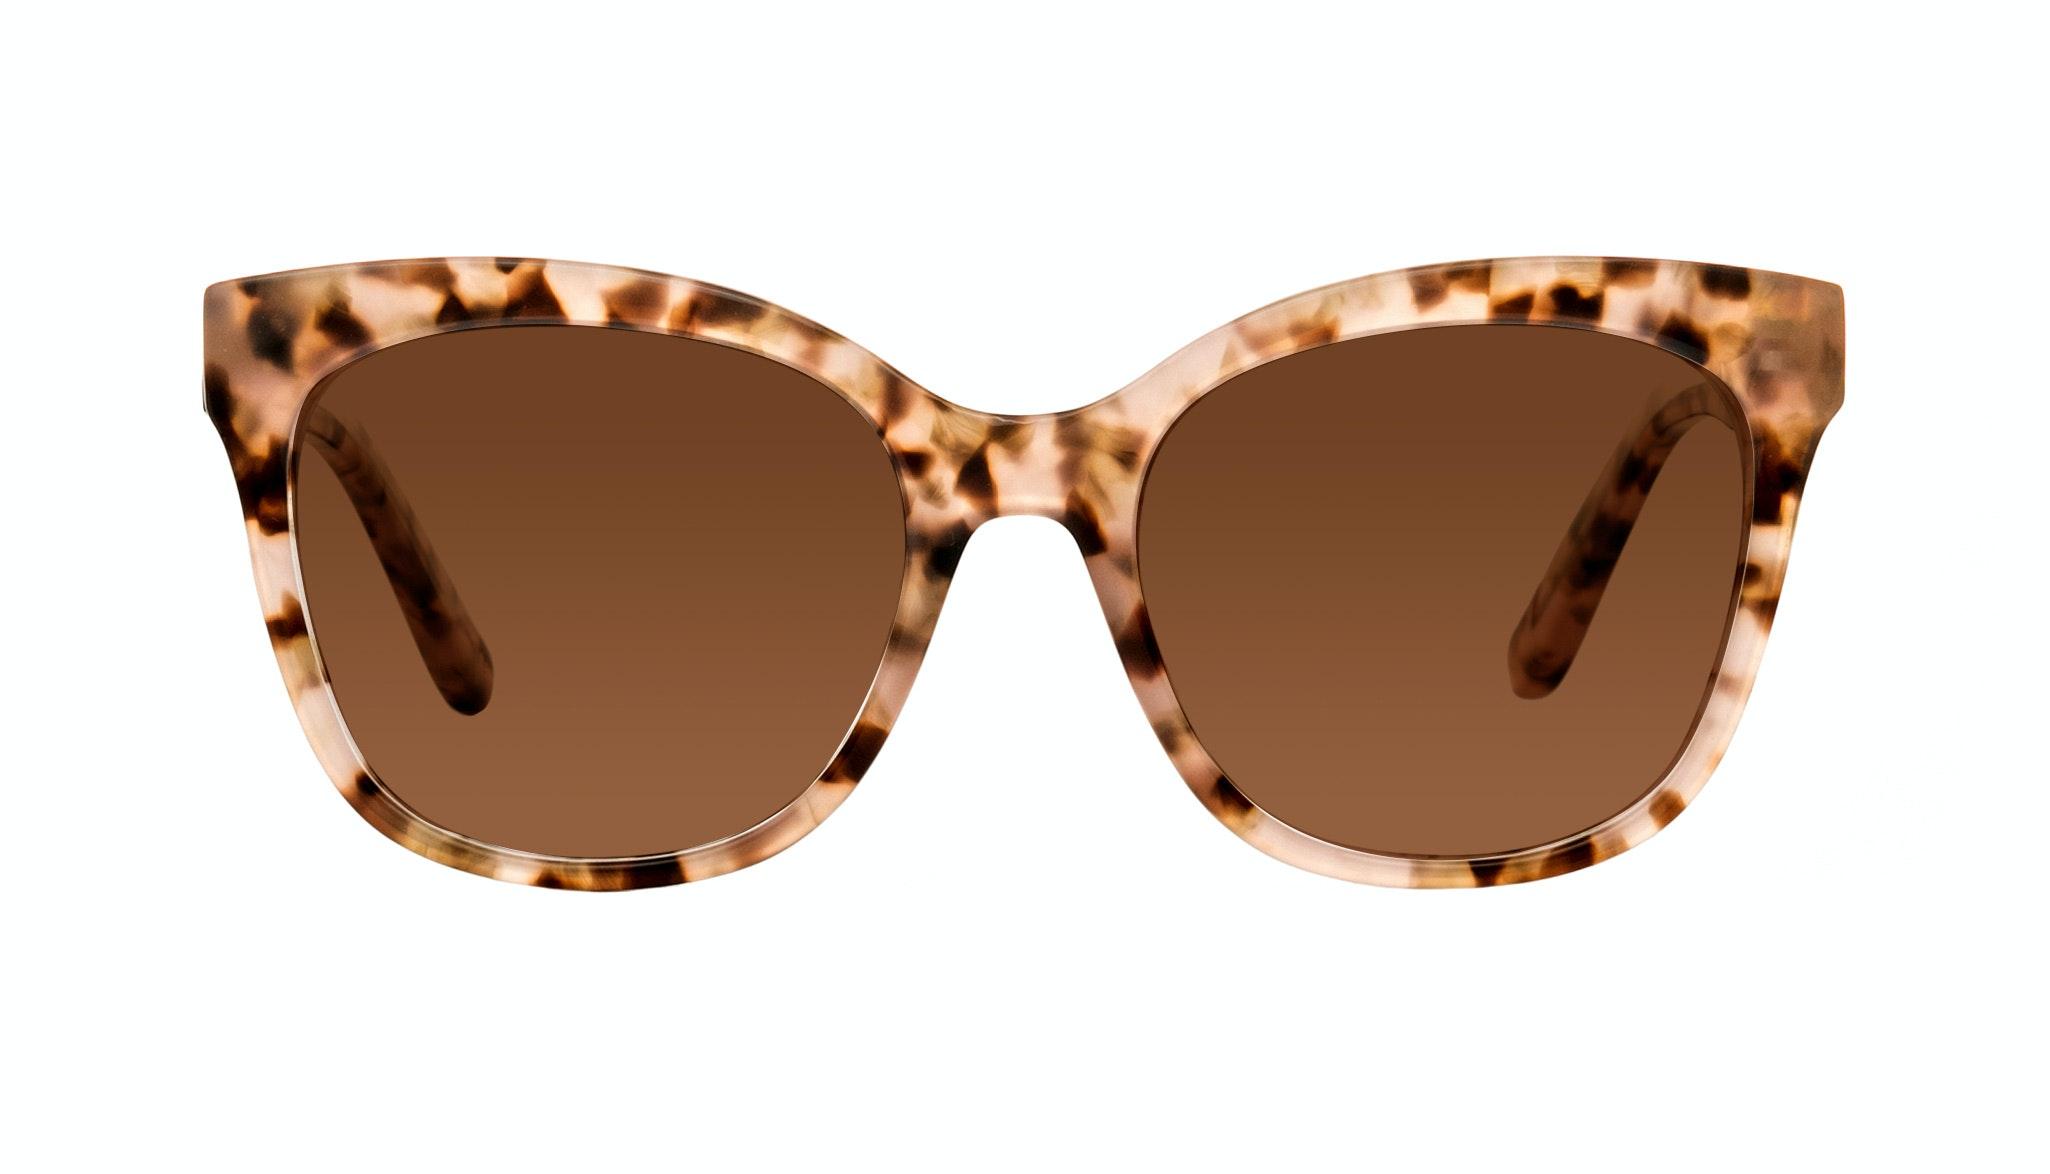 Affordable Fashion Glasses Square Sunglasses Women Breezy Pink Leopard Front